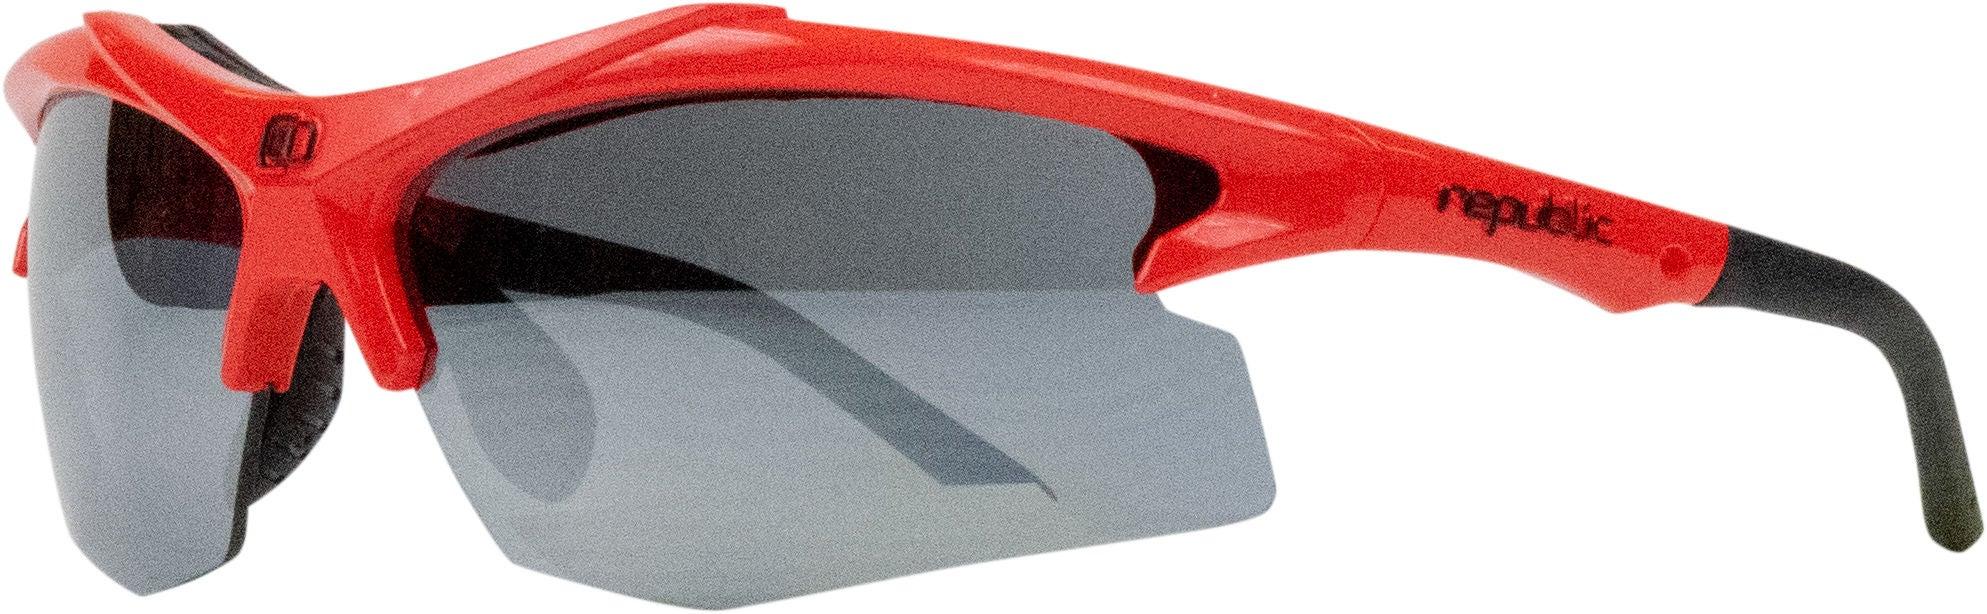 Republic Sportglasögon R100, Röd S